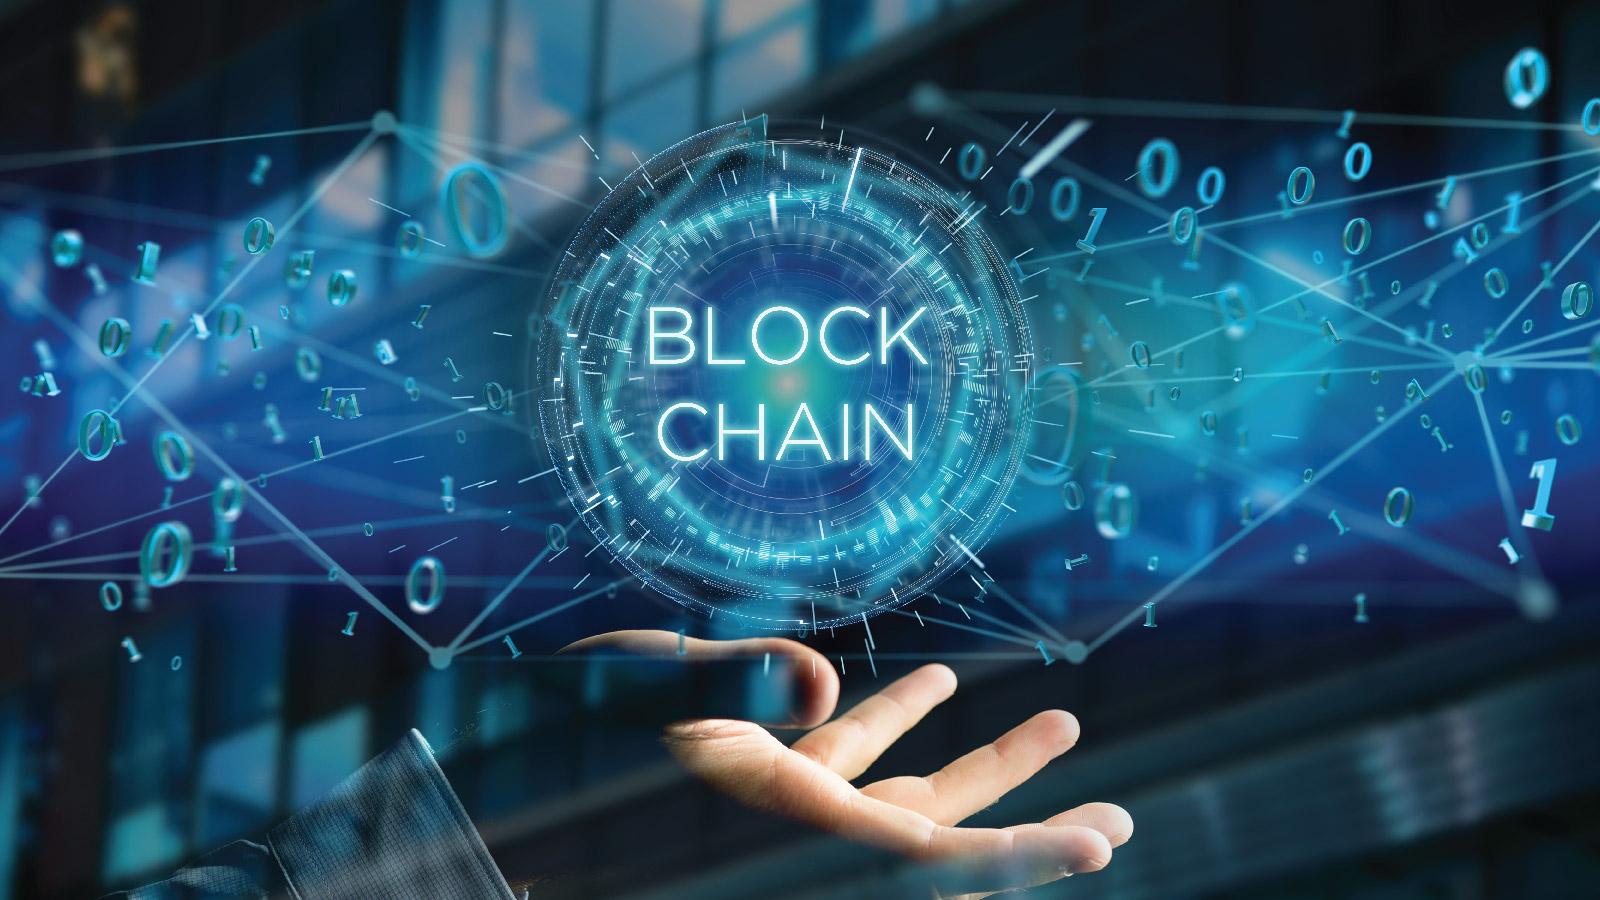 What's Next for Blockchain Application? EnterpriseTalk